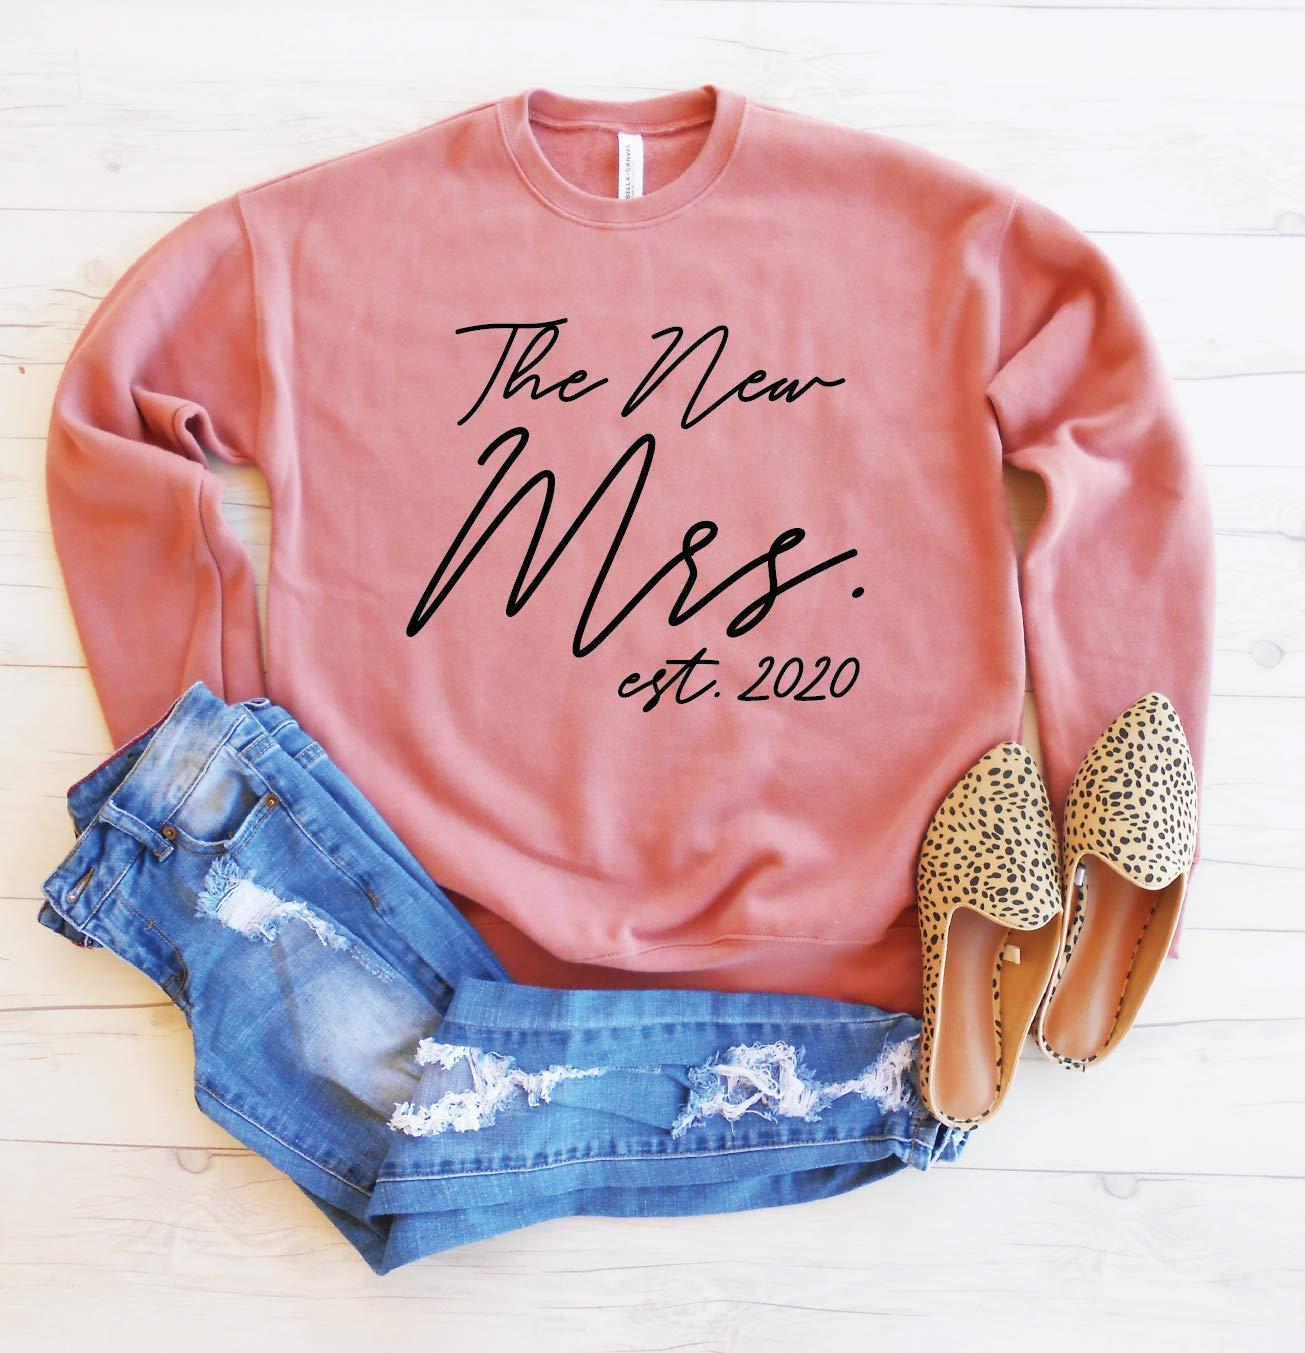 The Fees free!! New Mrs Bargain sale Est 2020 Sweatshirt Shoulder Honeymoon Sweatsh Drop